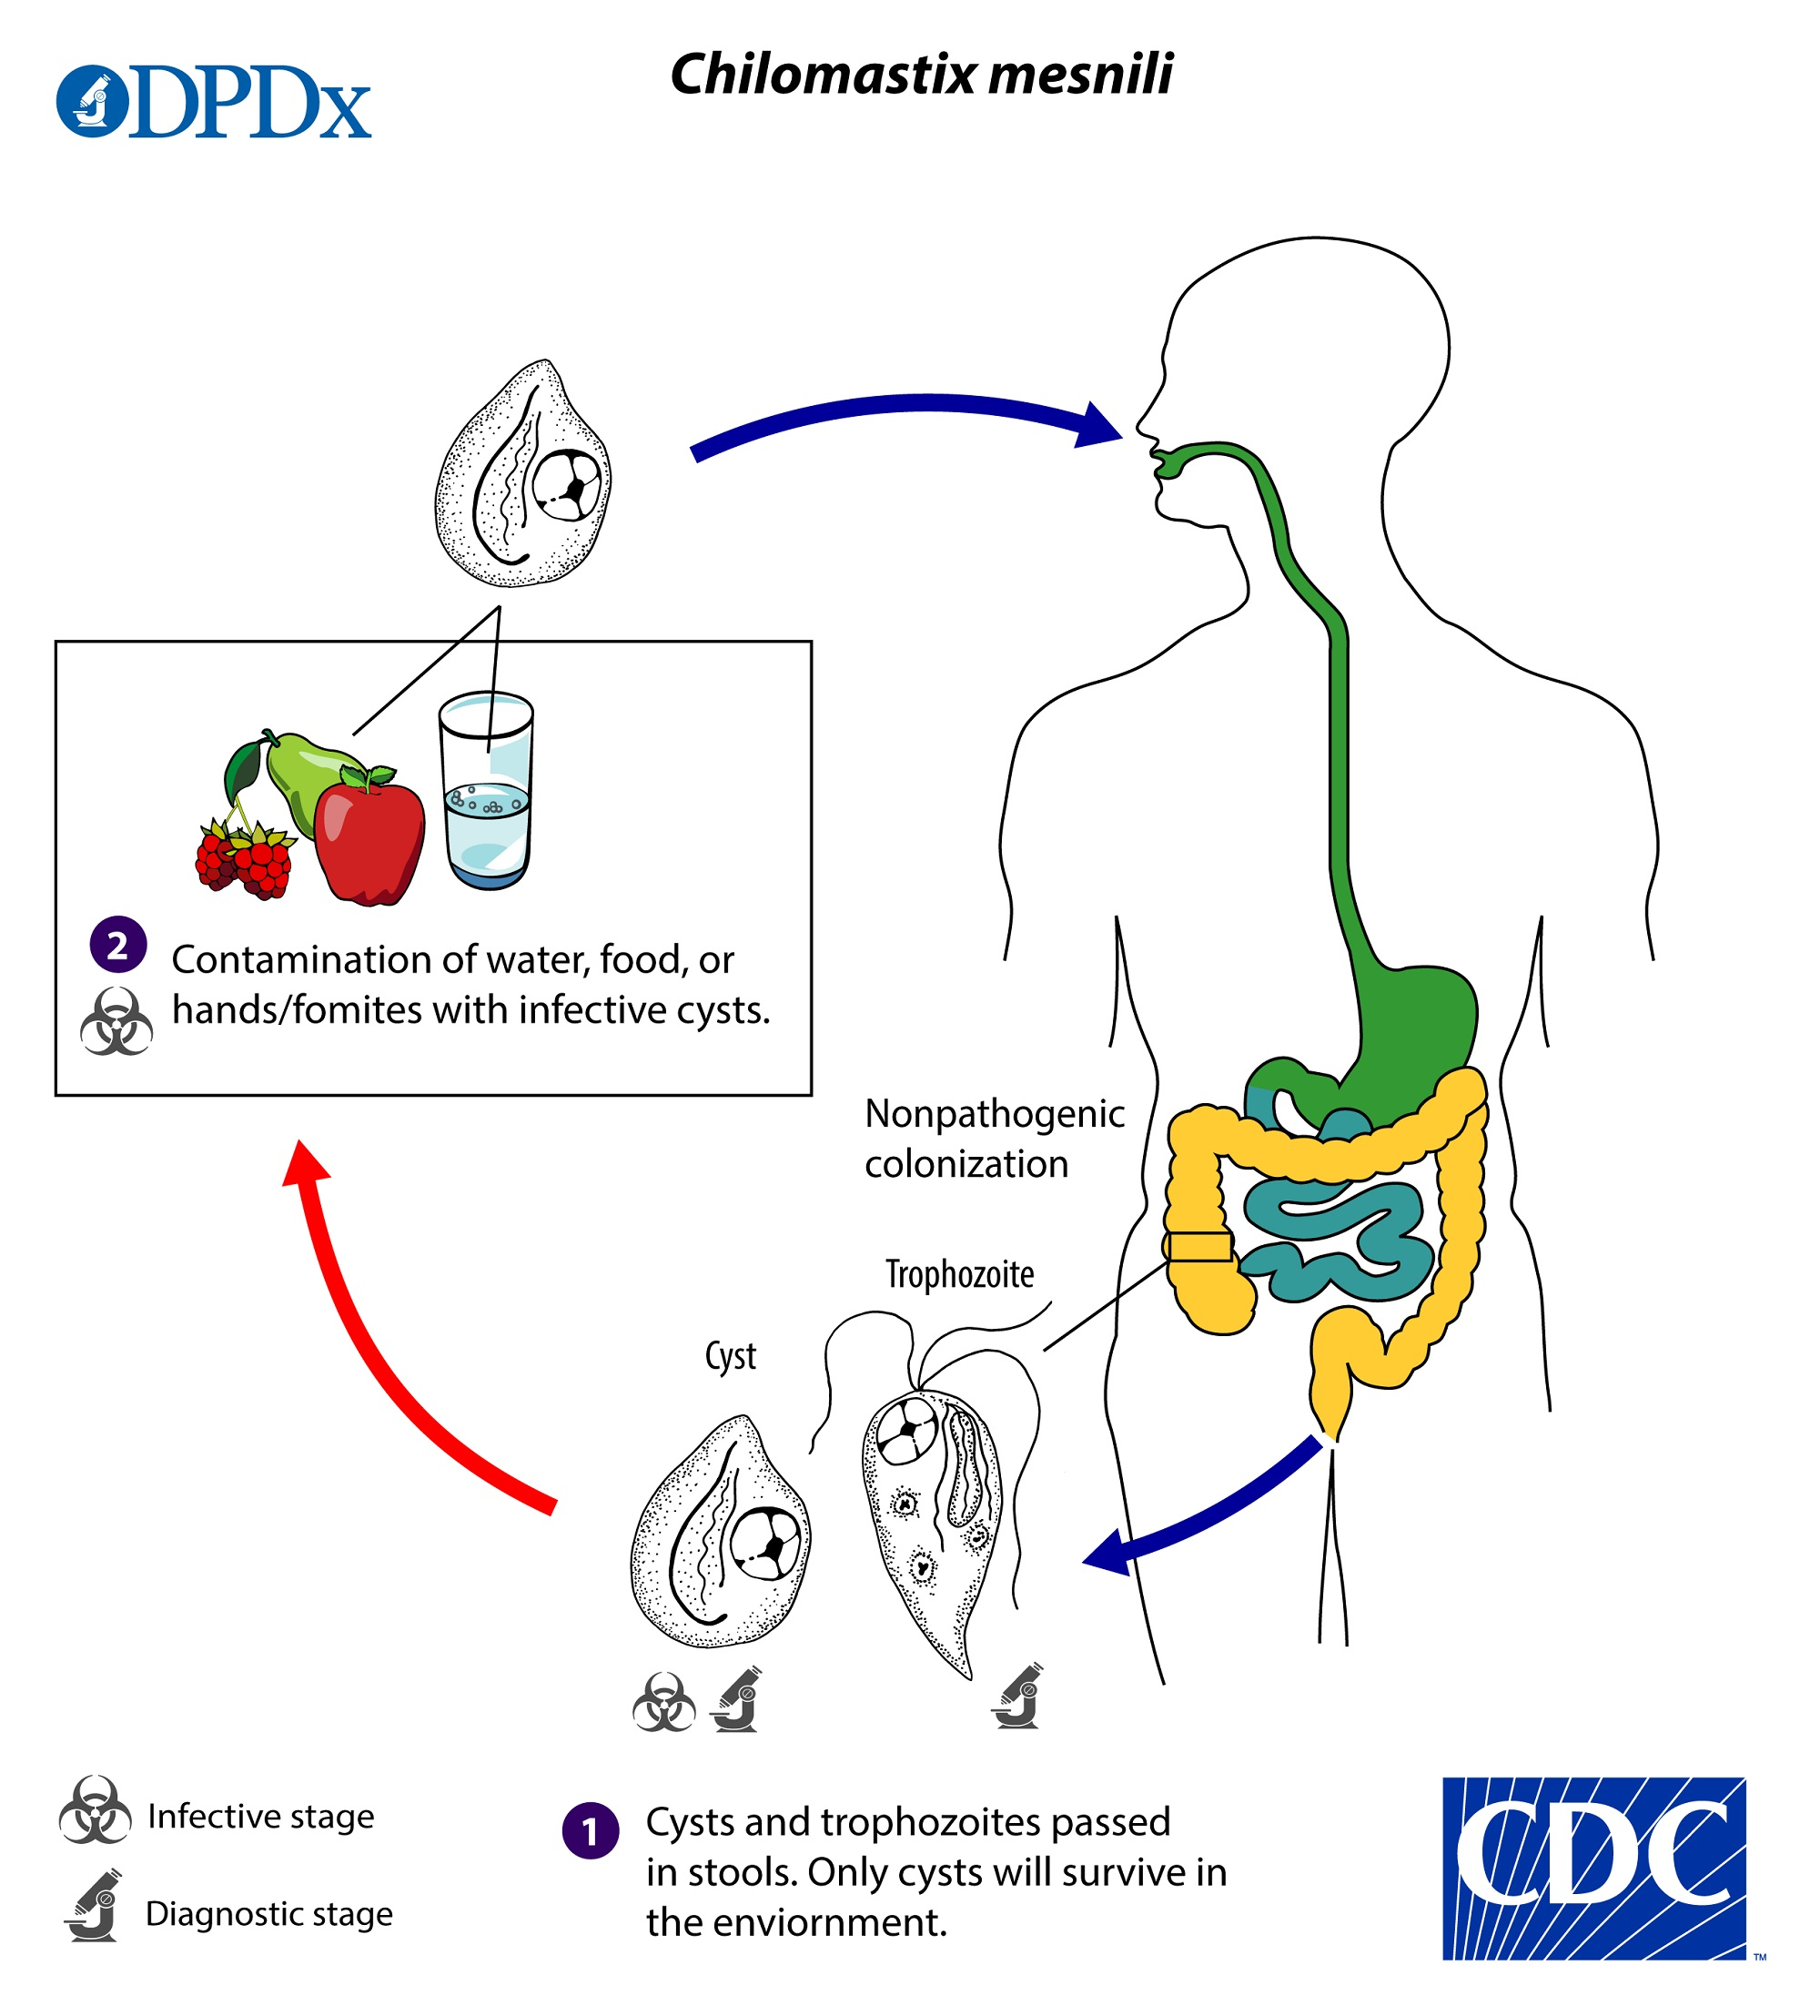 CDC - DPDx - Chilomastix mesnili